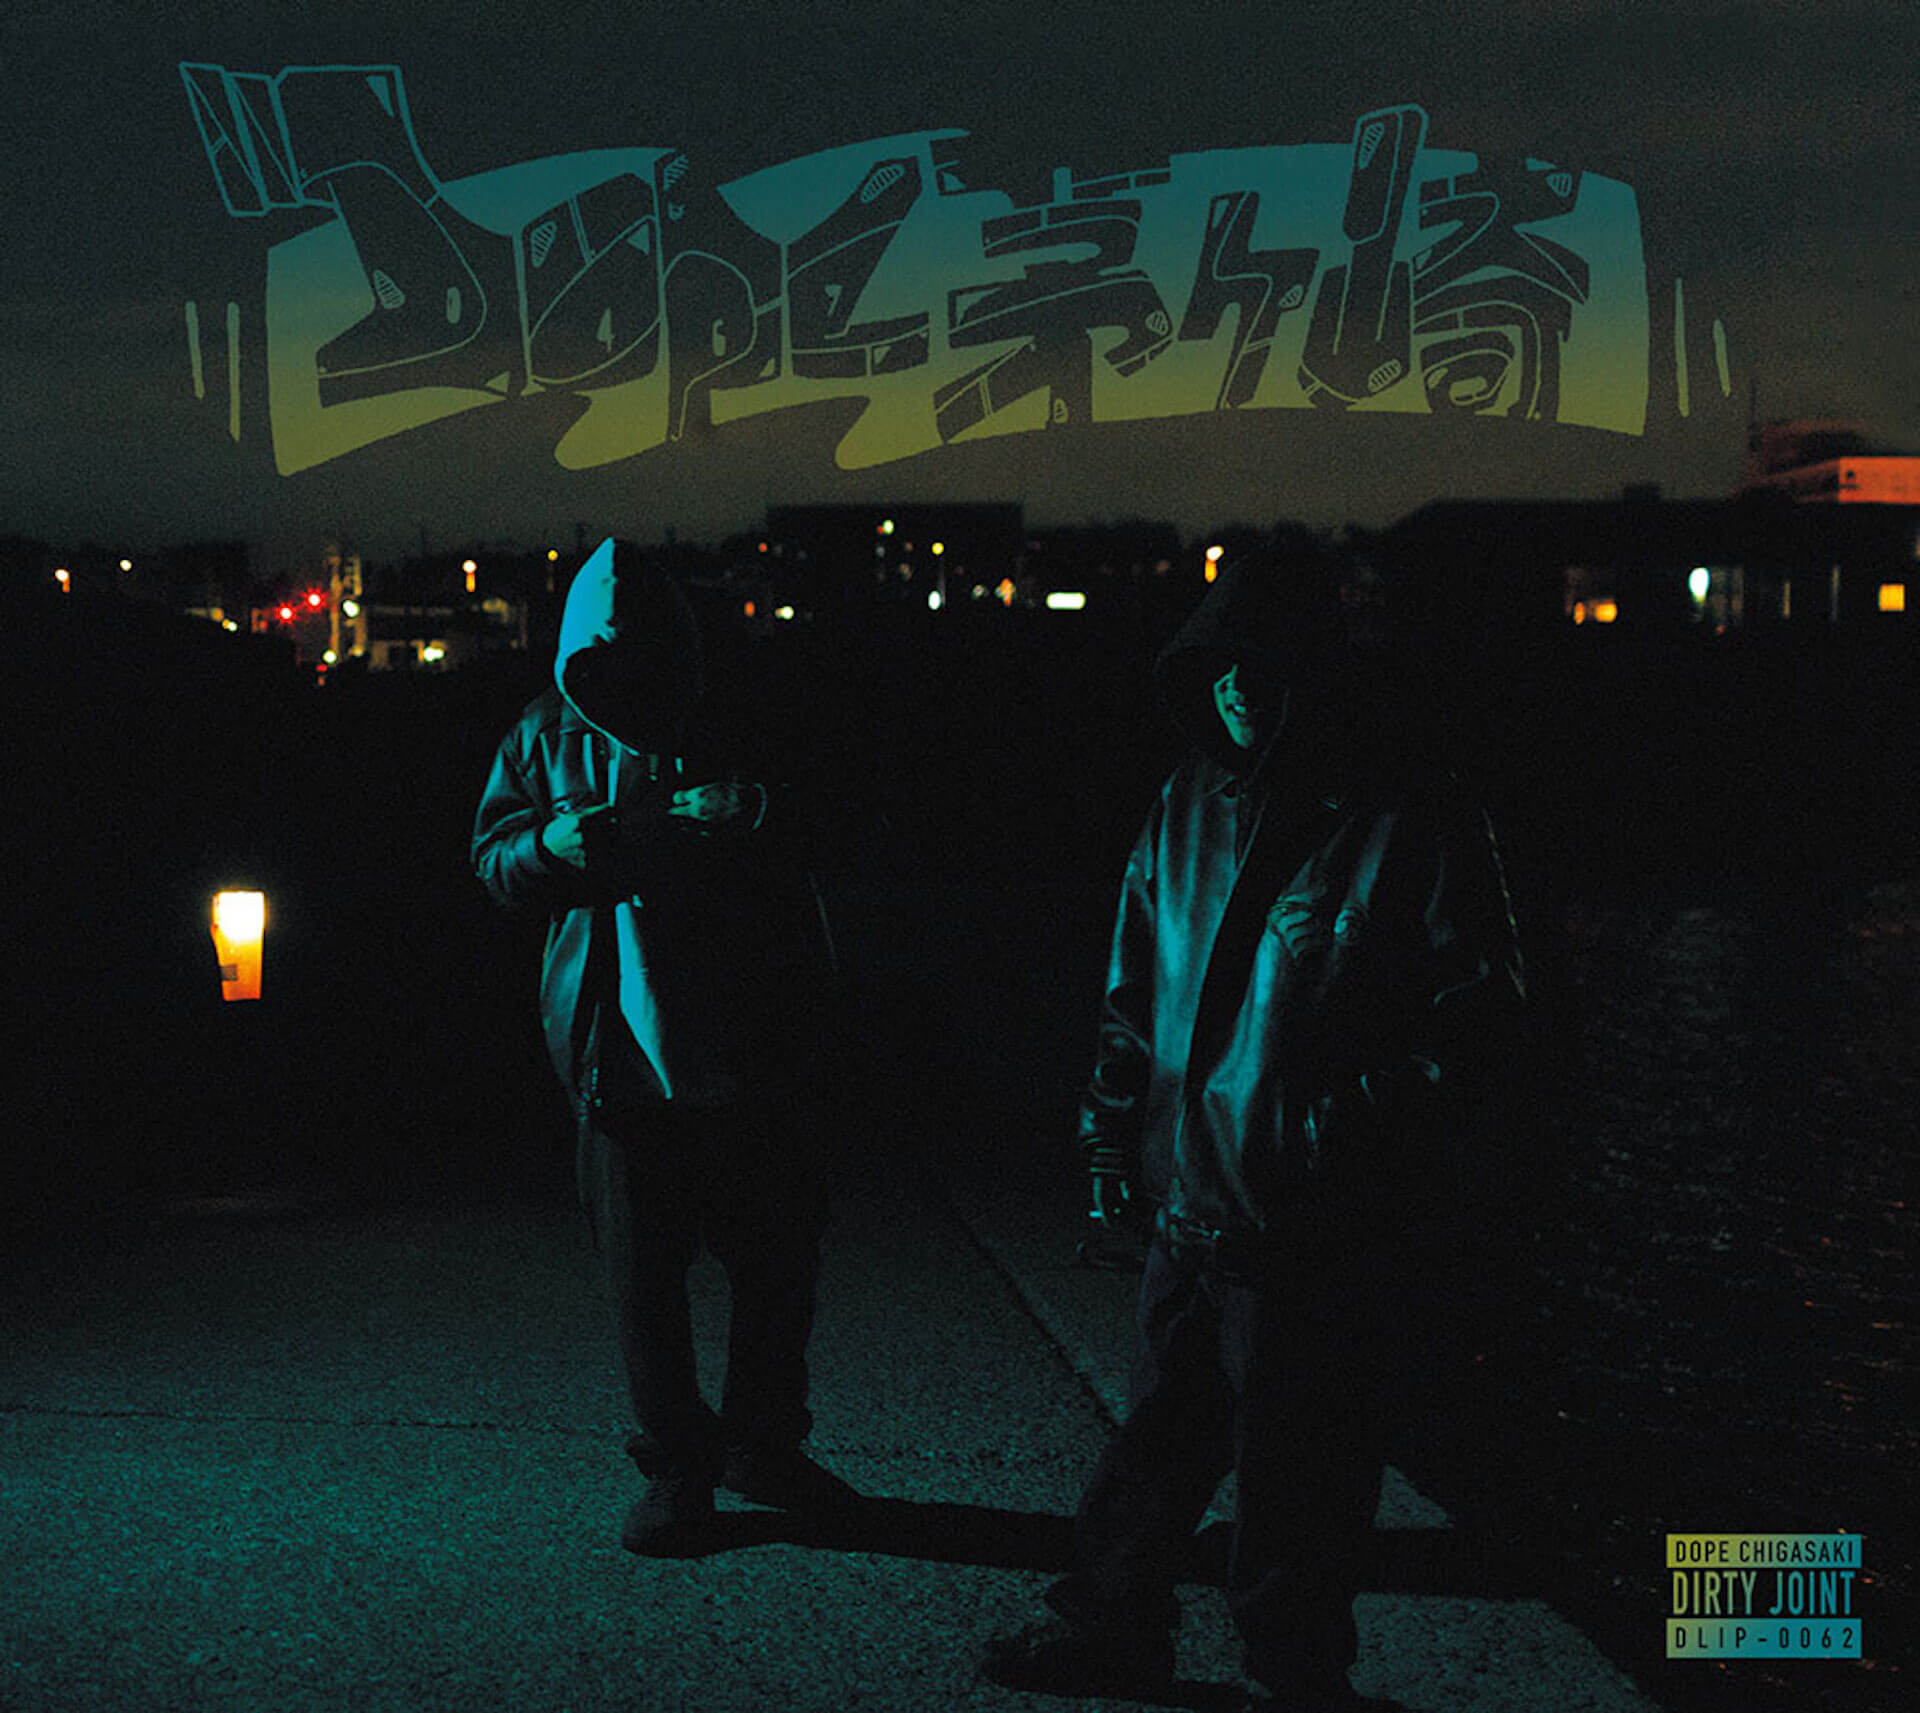 〈DLiP RECORDS〉主催イベント<BLAQLIST>でもおなじみのDIRTY JOINTが『DOPE CHIGASAKI』をリリース決定! music200825_dirtyjoint_1